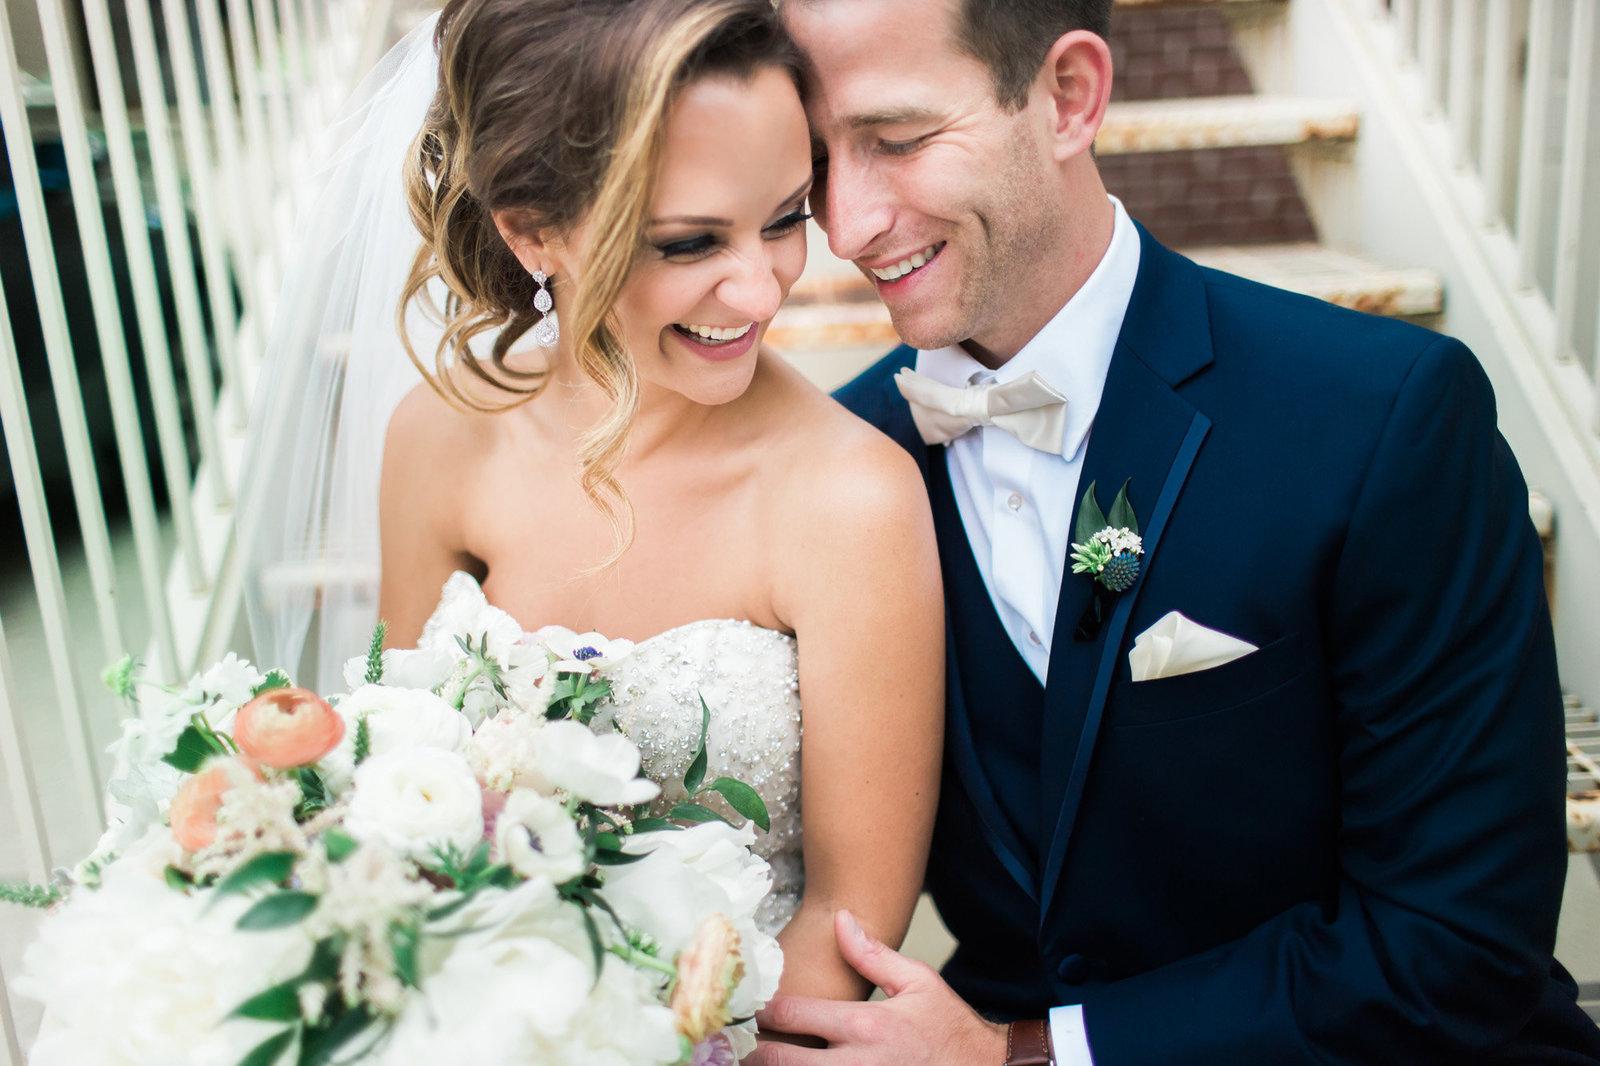 Mishelle Lamarand Photography 2016Michigan Wedding PhotographerNorthville Wedding PhotographerAnn Arbor Wedding Photographer